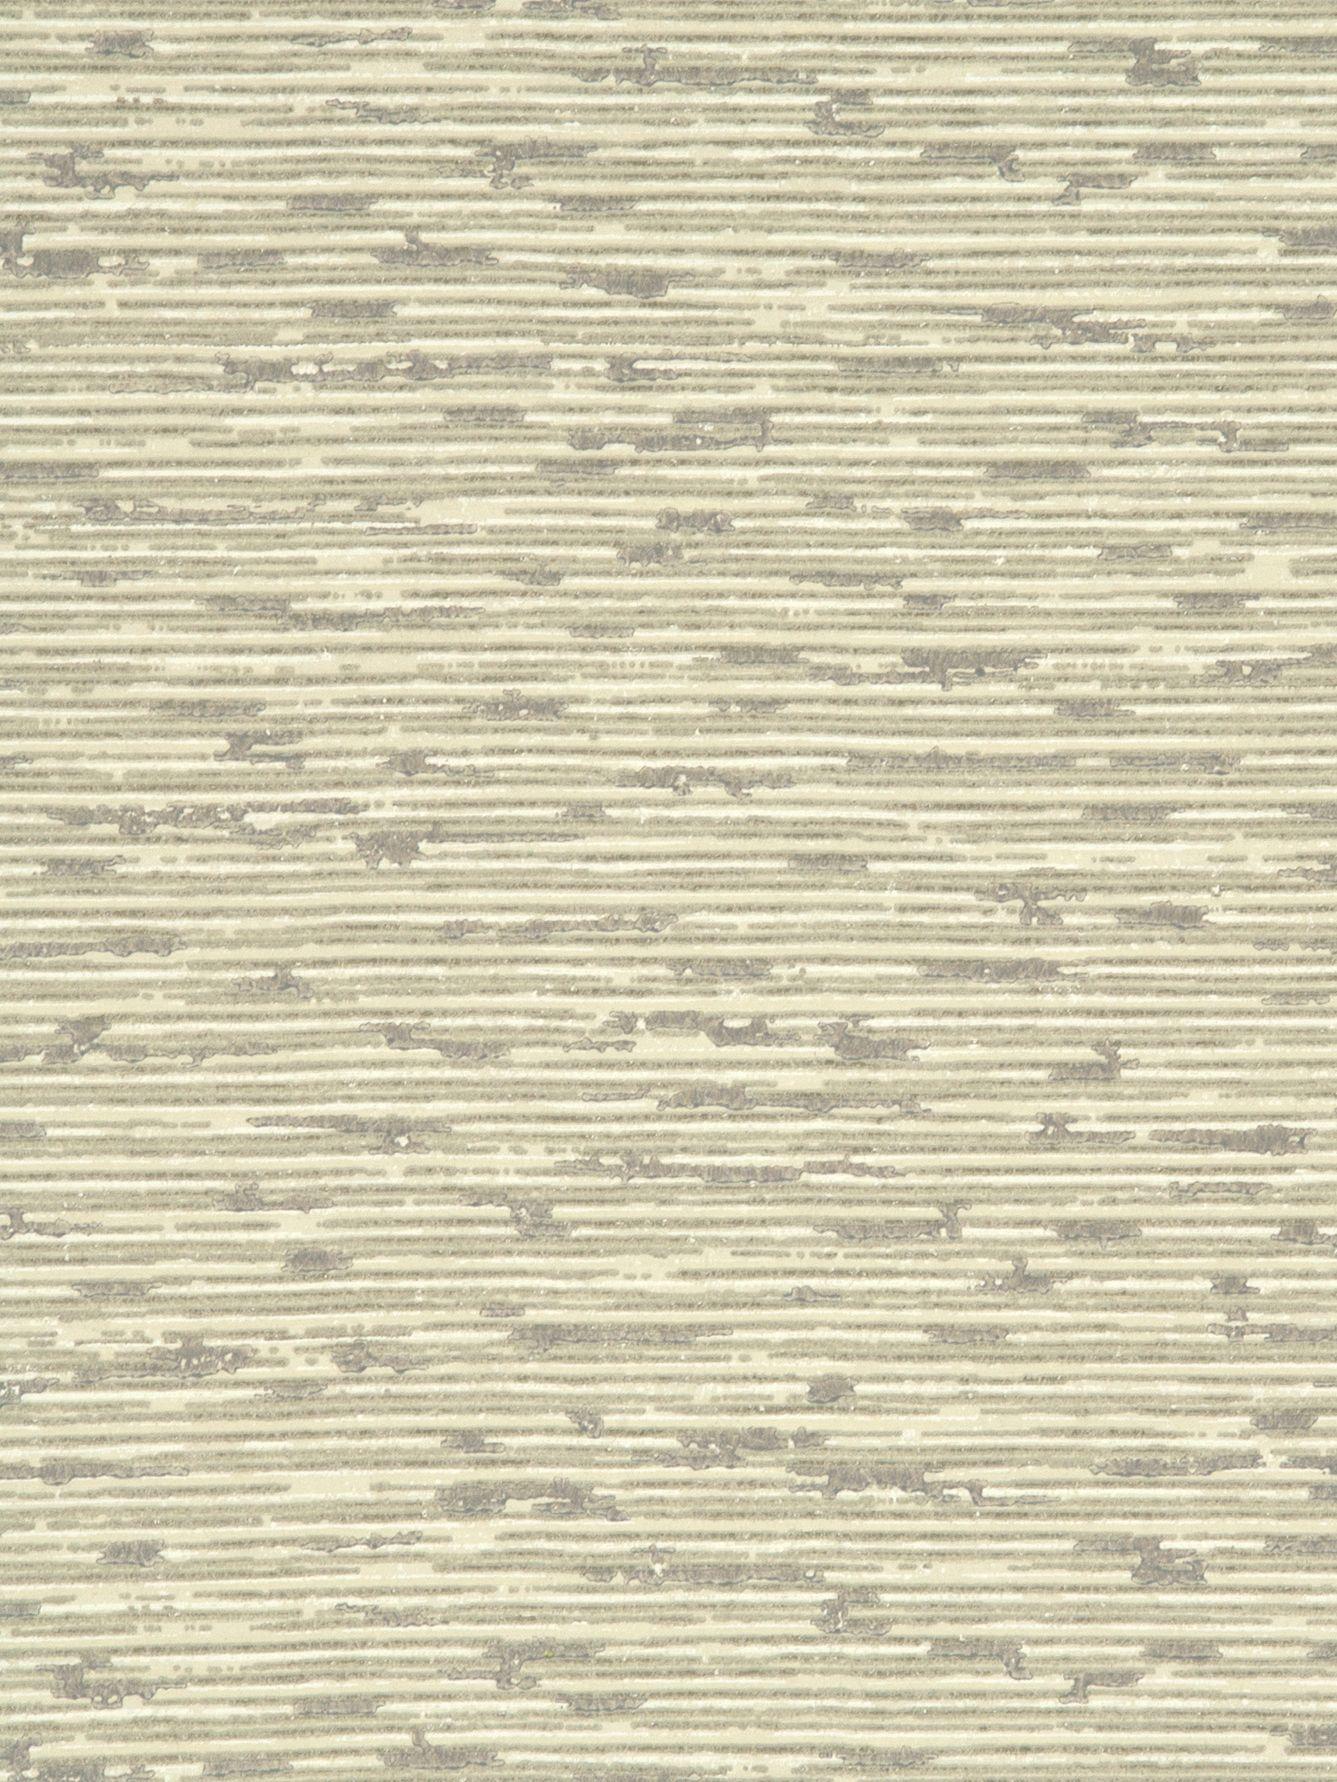 GP & J Baker GP & J Baker Grasscloth Wallpaper